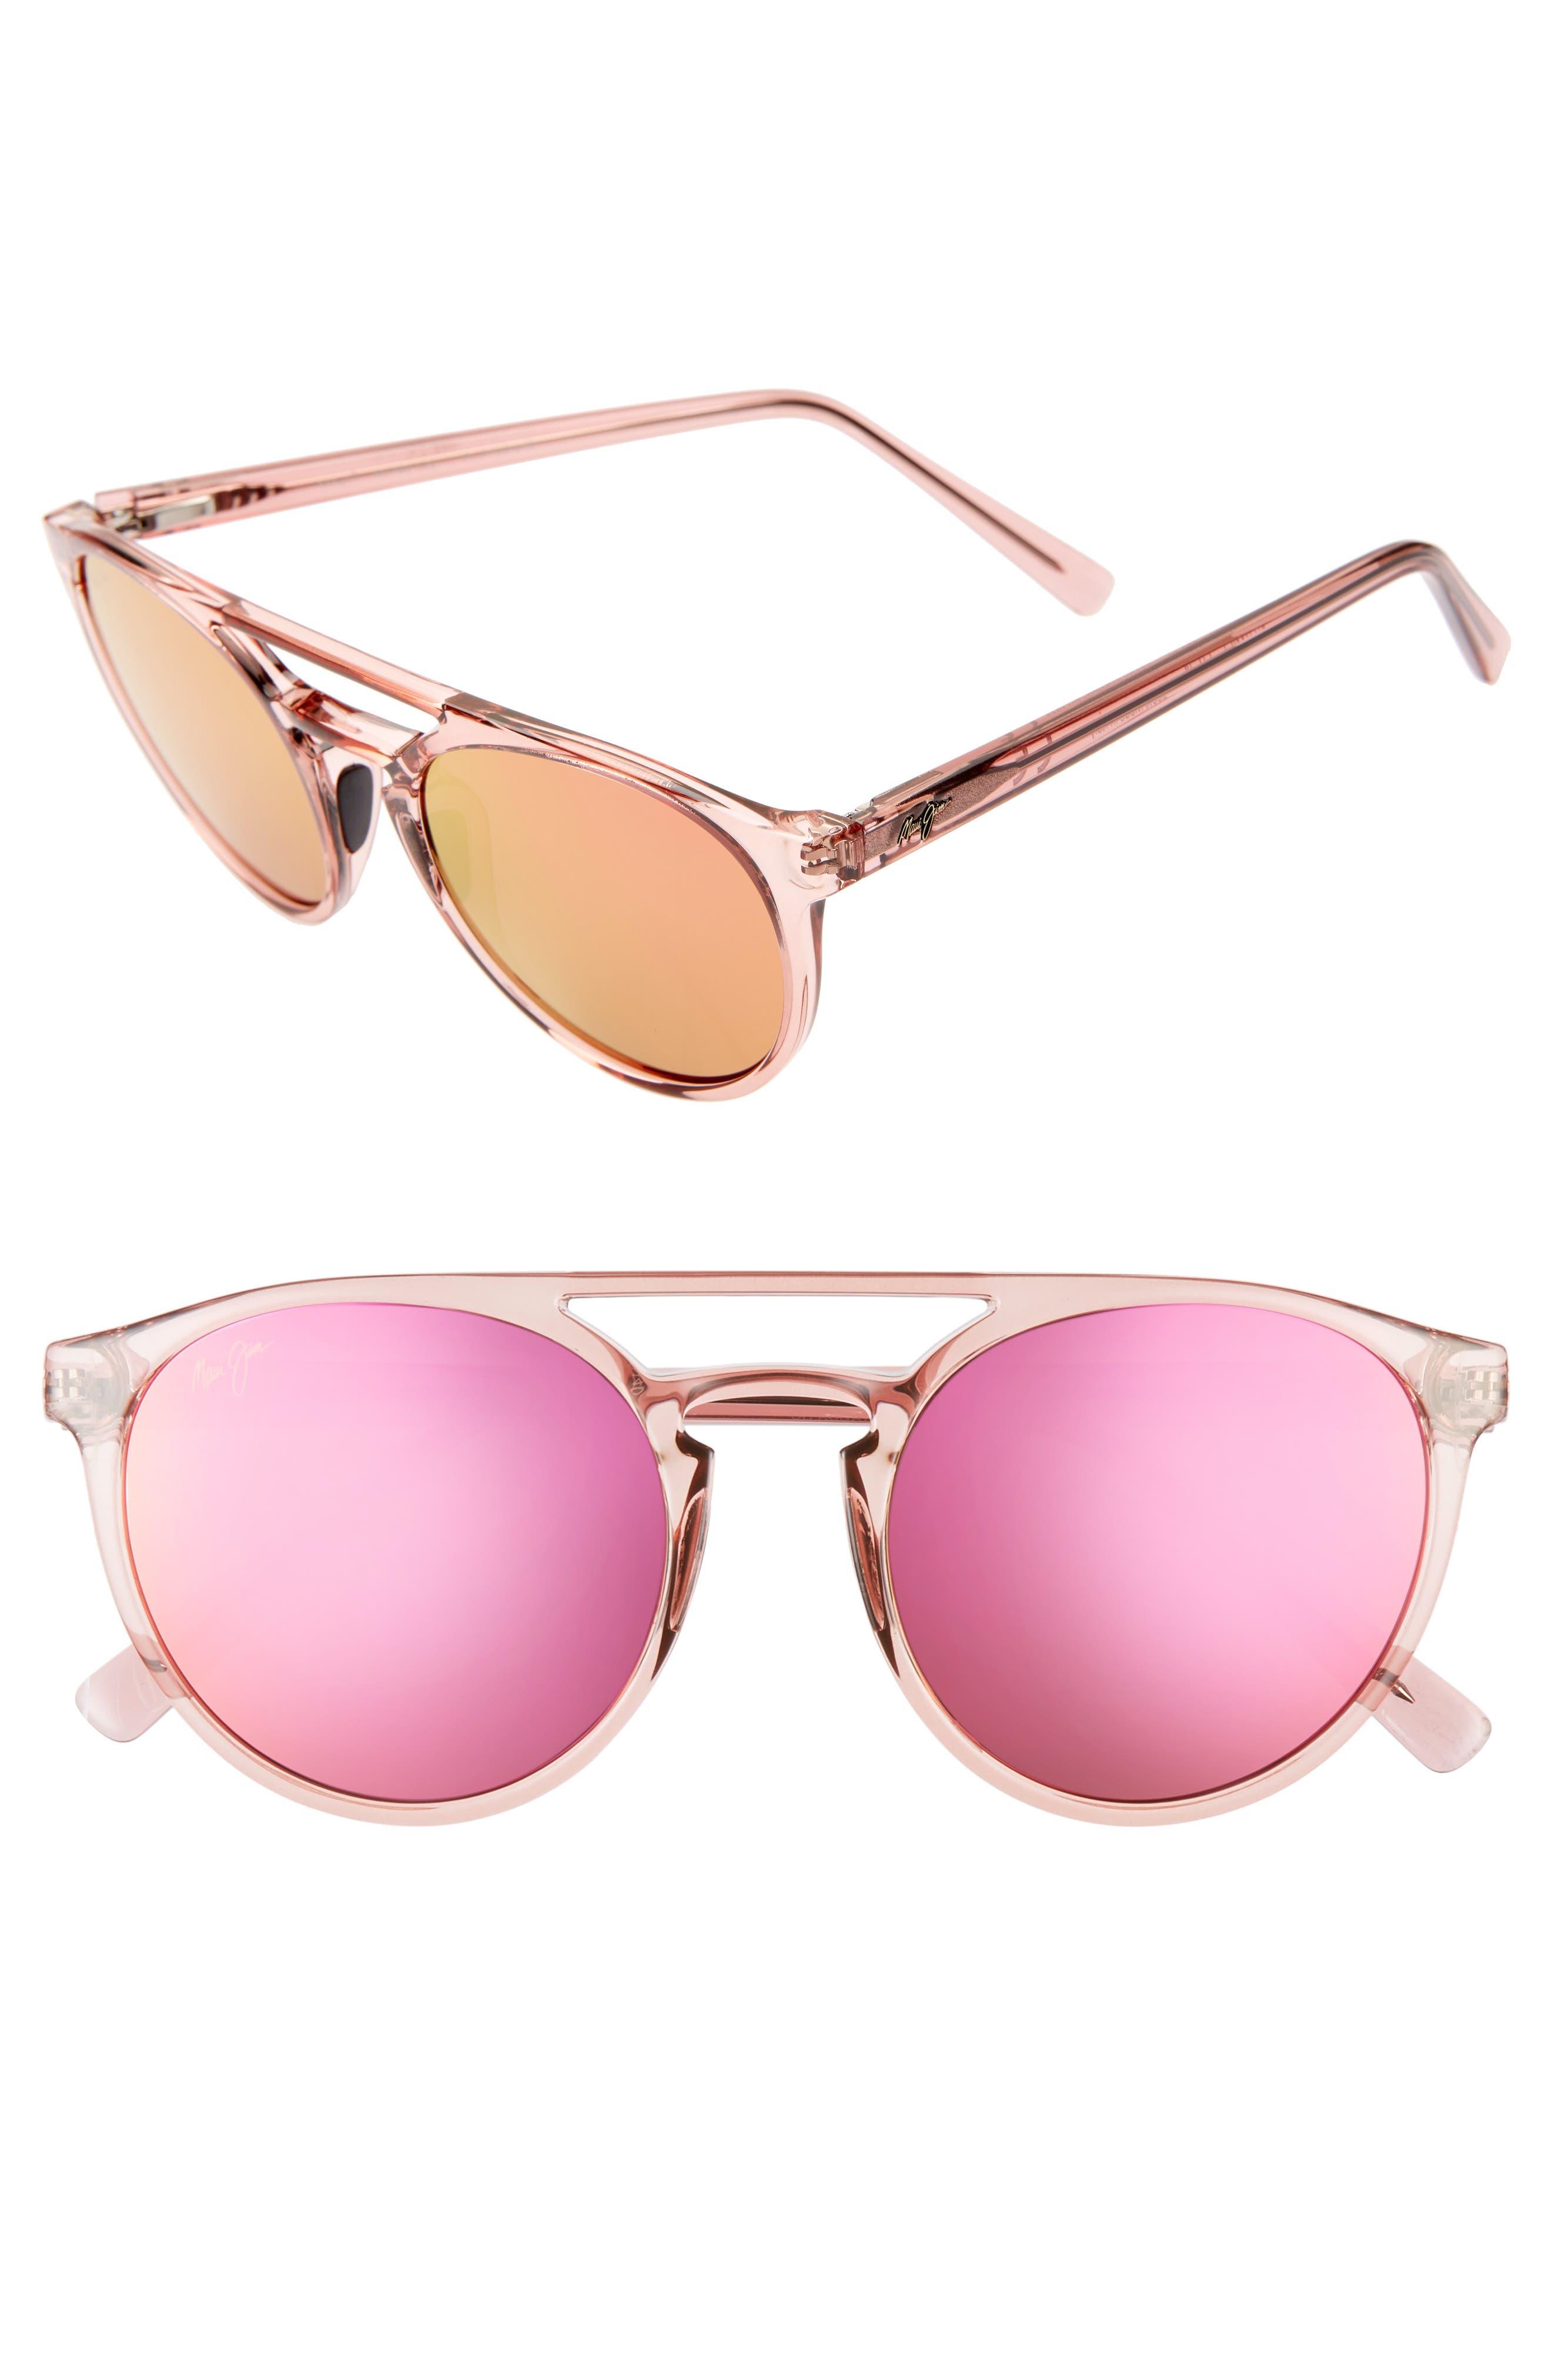 04c8cea077abe Women s Pink Maui Jim Sunglasses